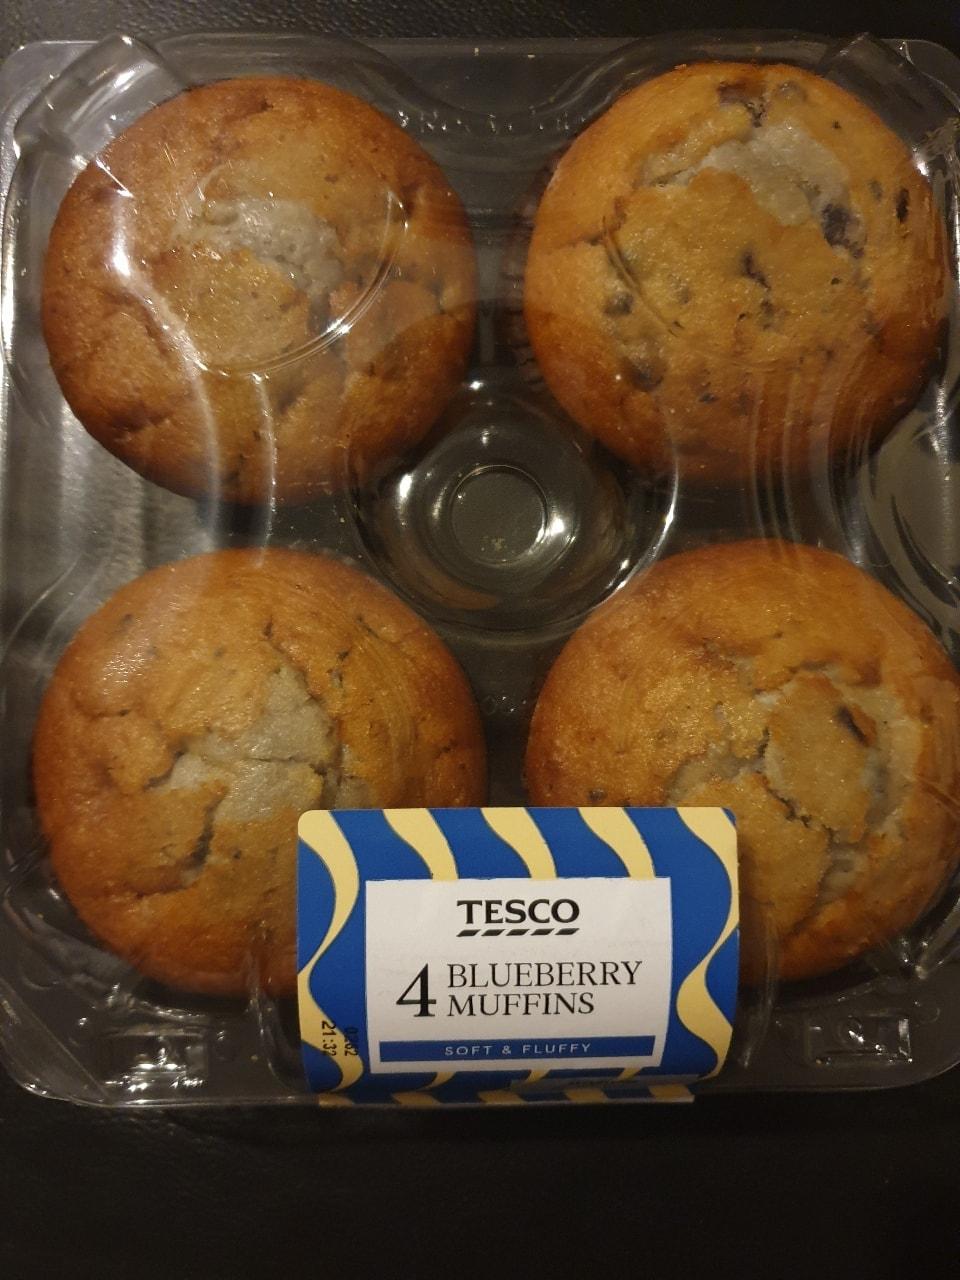 4 blueberry muffins